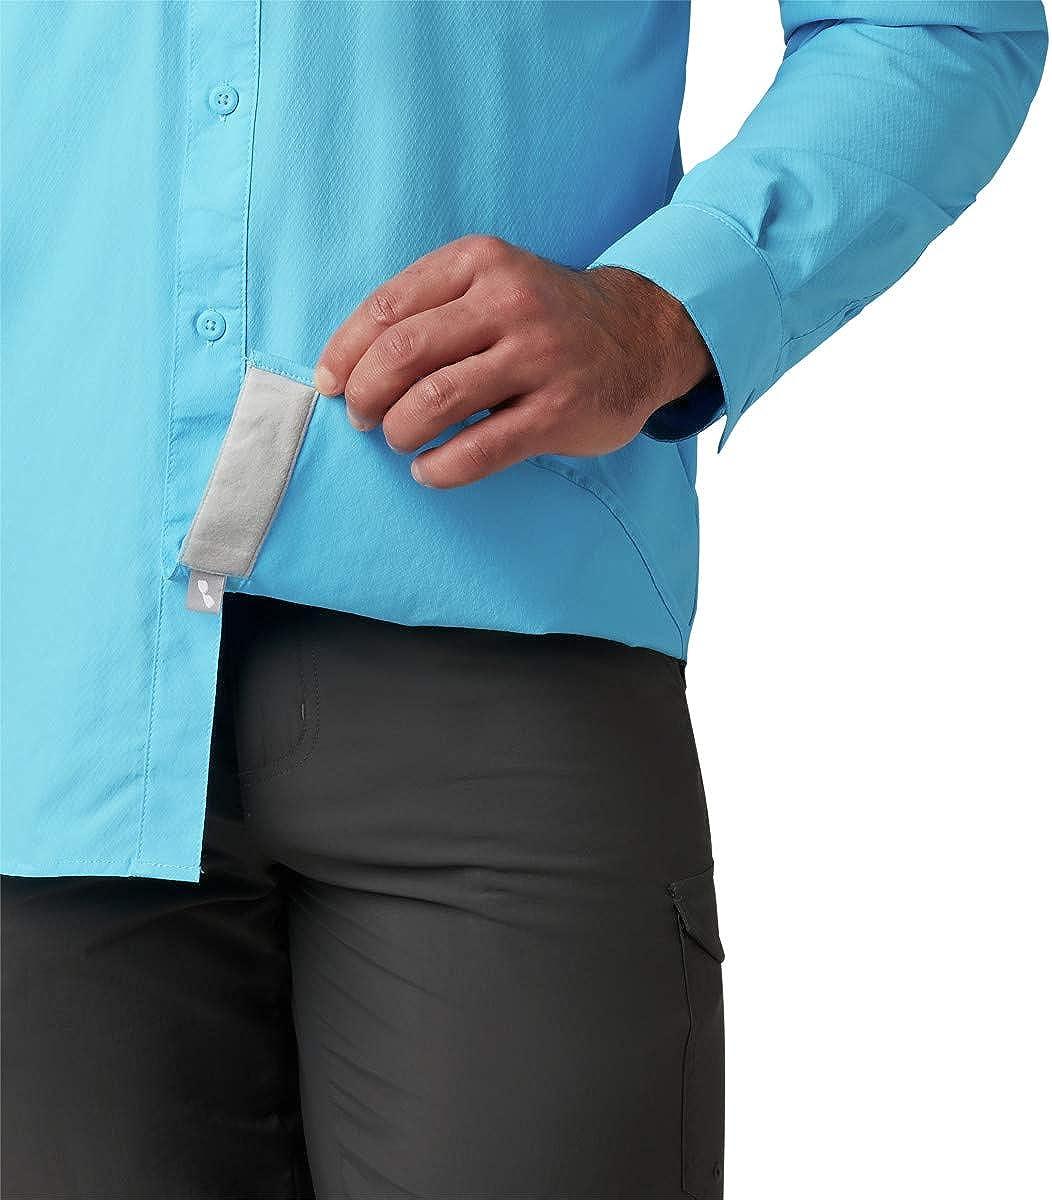 Columbia Mens PFG Terminal Tackle Long Sleeve Woven UV Sun Protection Breathable